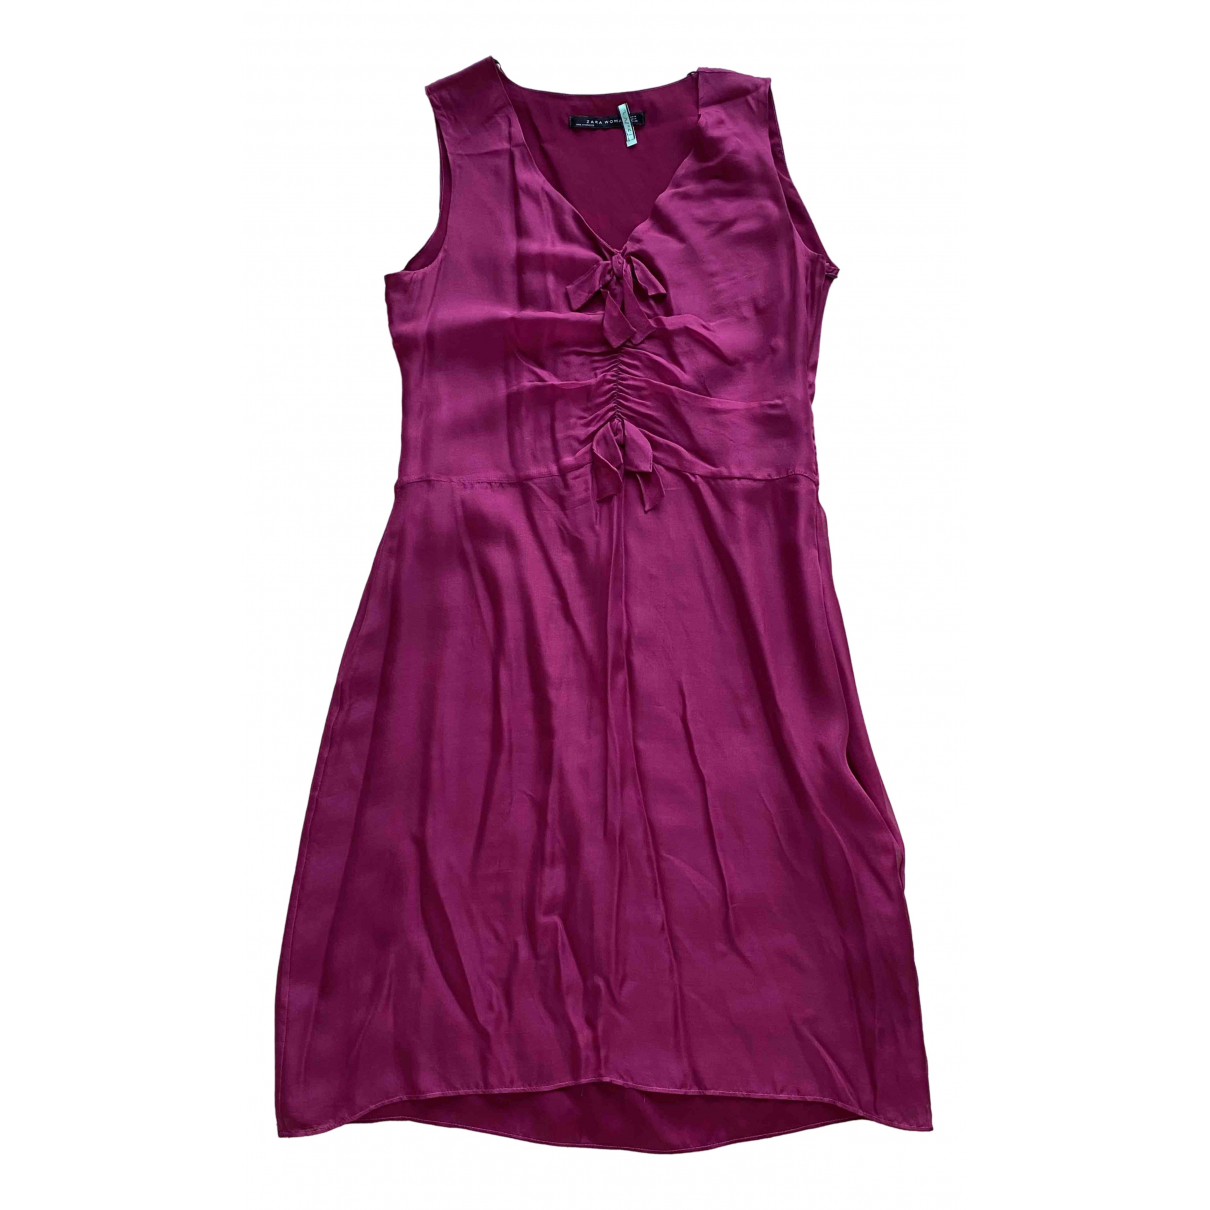 Zara - Robe   pour femme en soie - violet